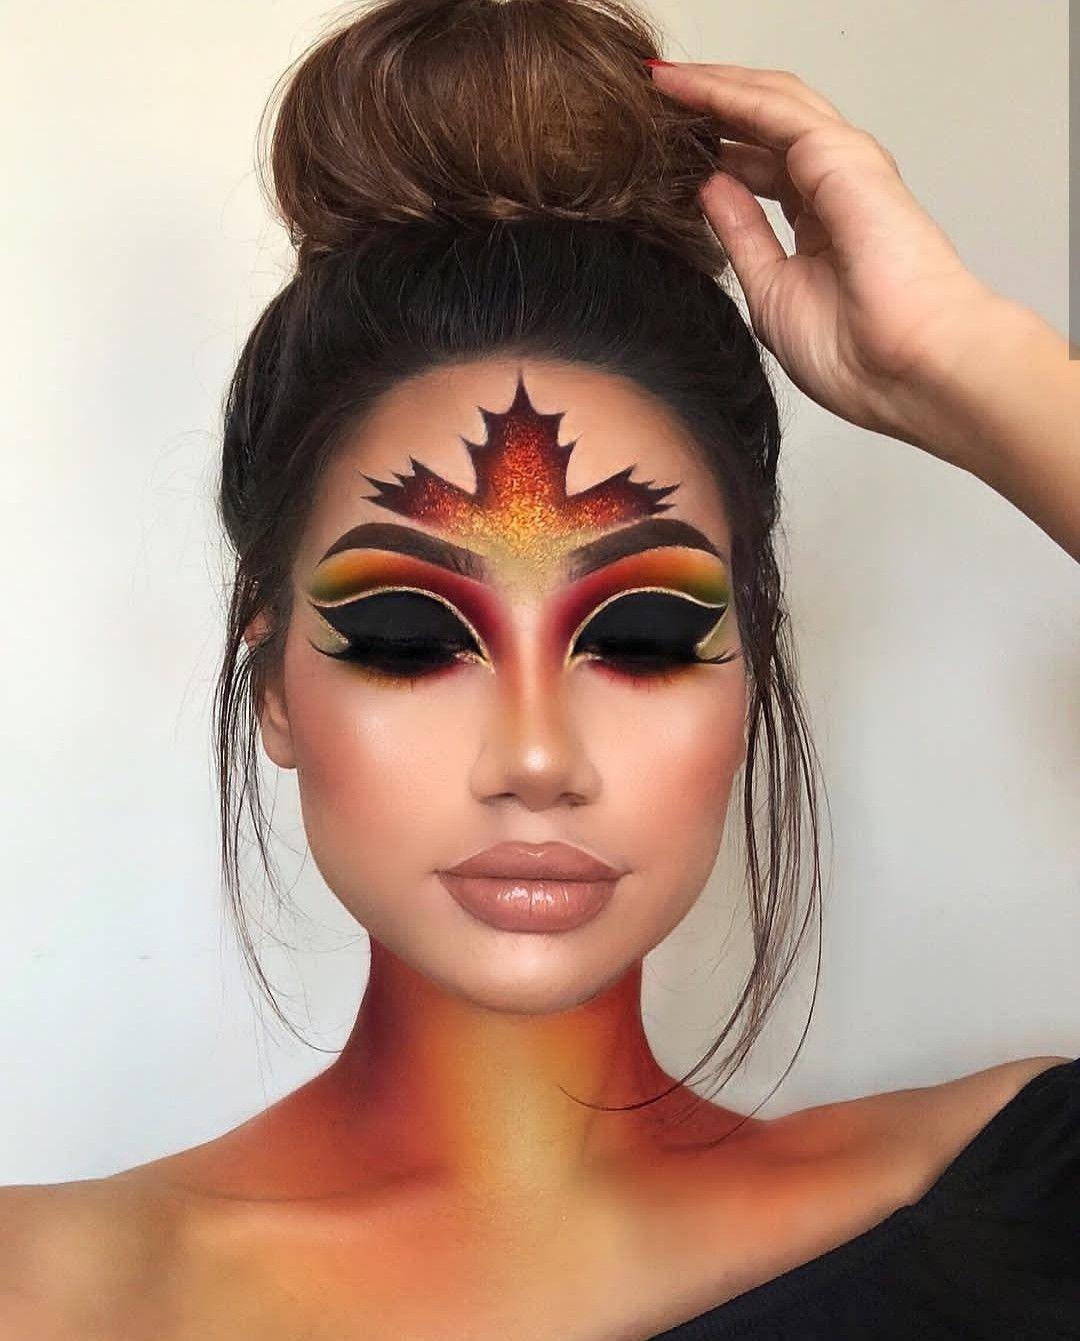 Makeup art. Leaf art Halloween makeup easy